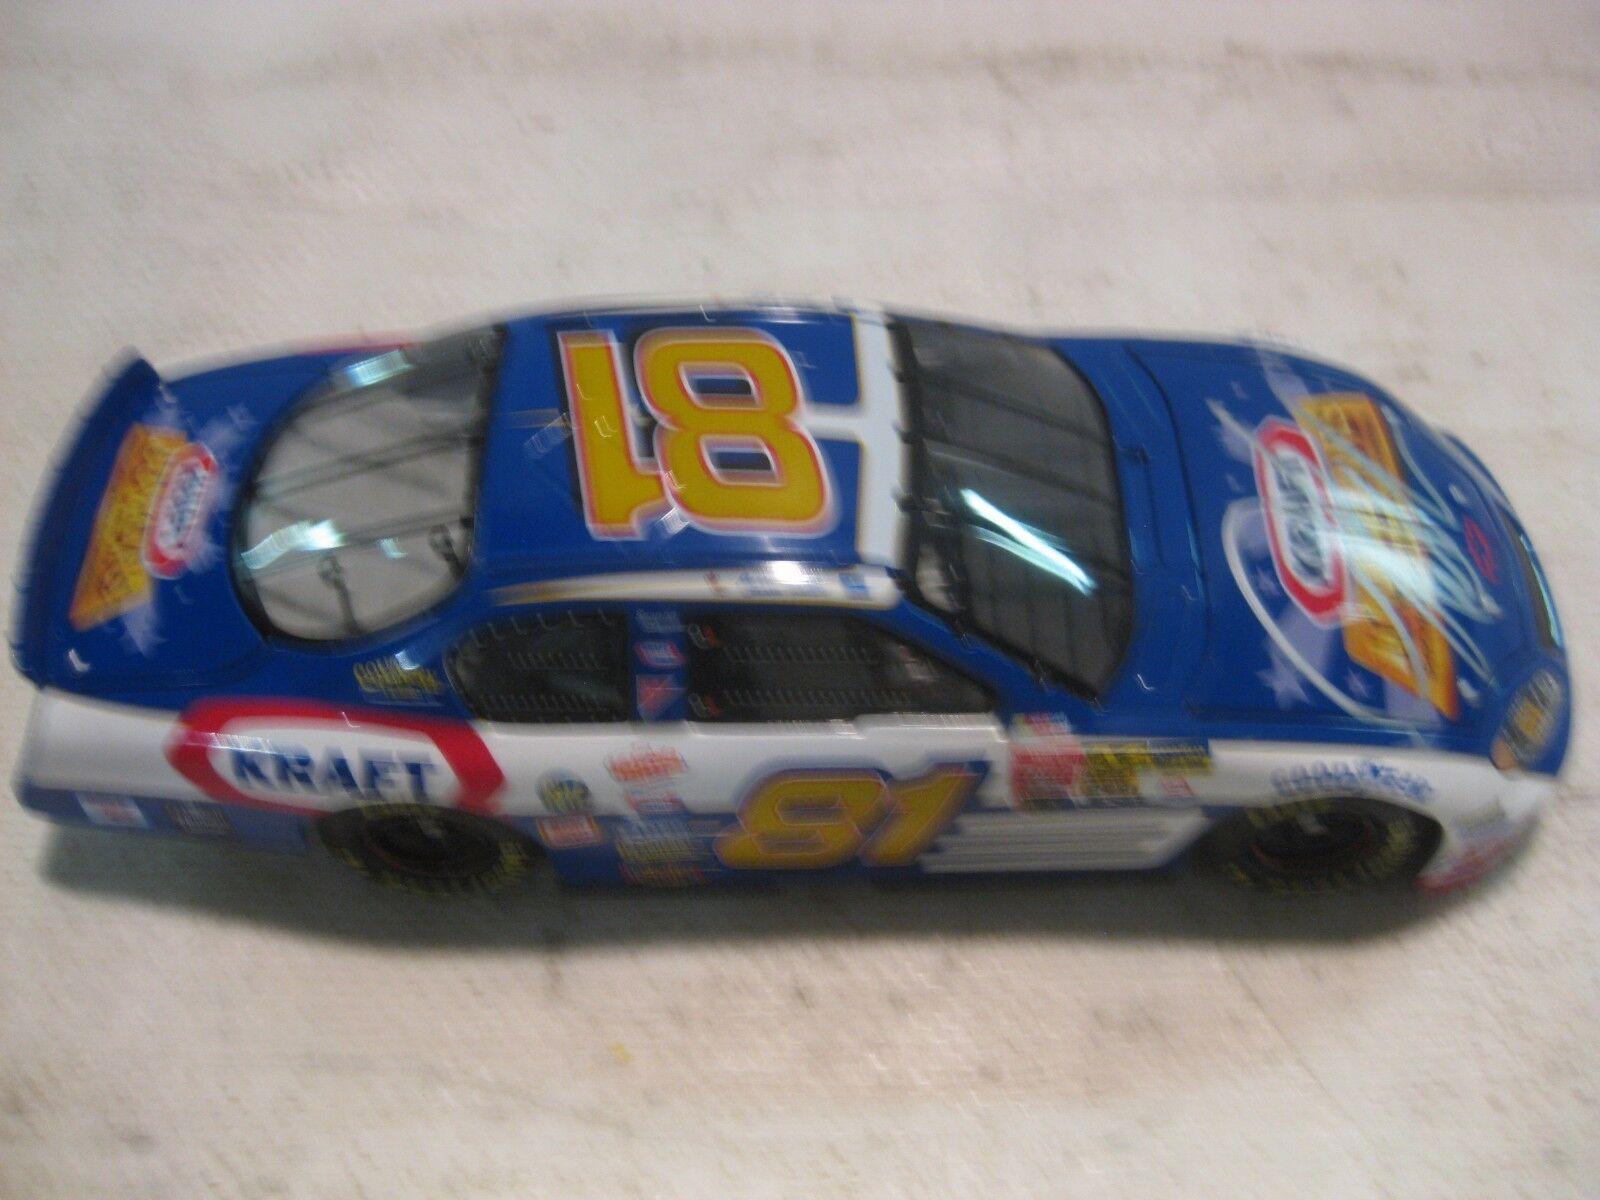 Nascar Jason Keller Kraft Monte Carlo 124 Scale Diecast Action 2003 dc653